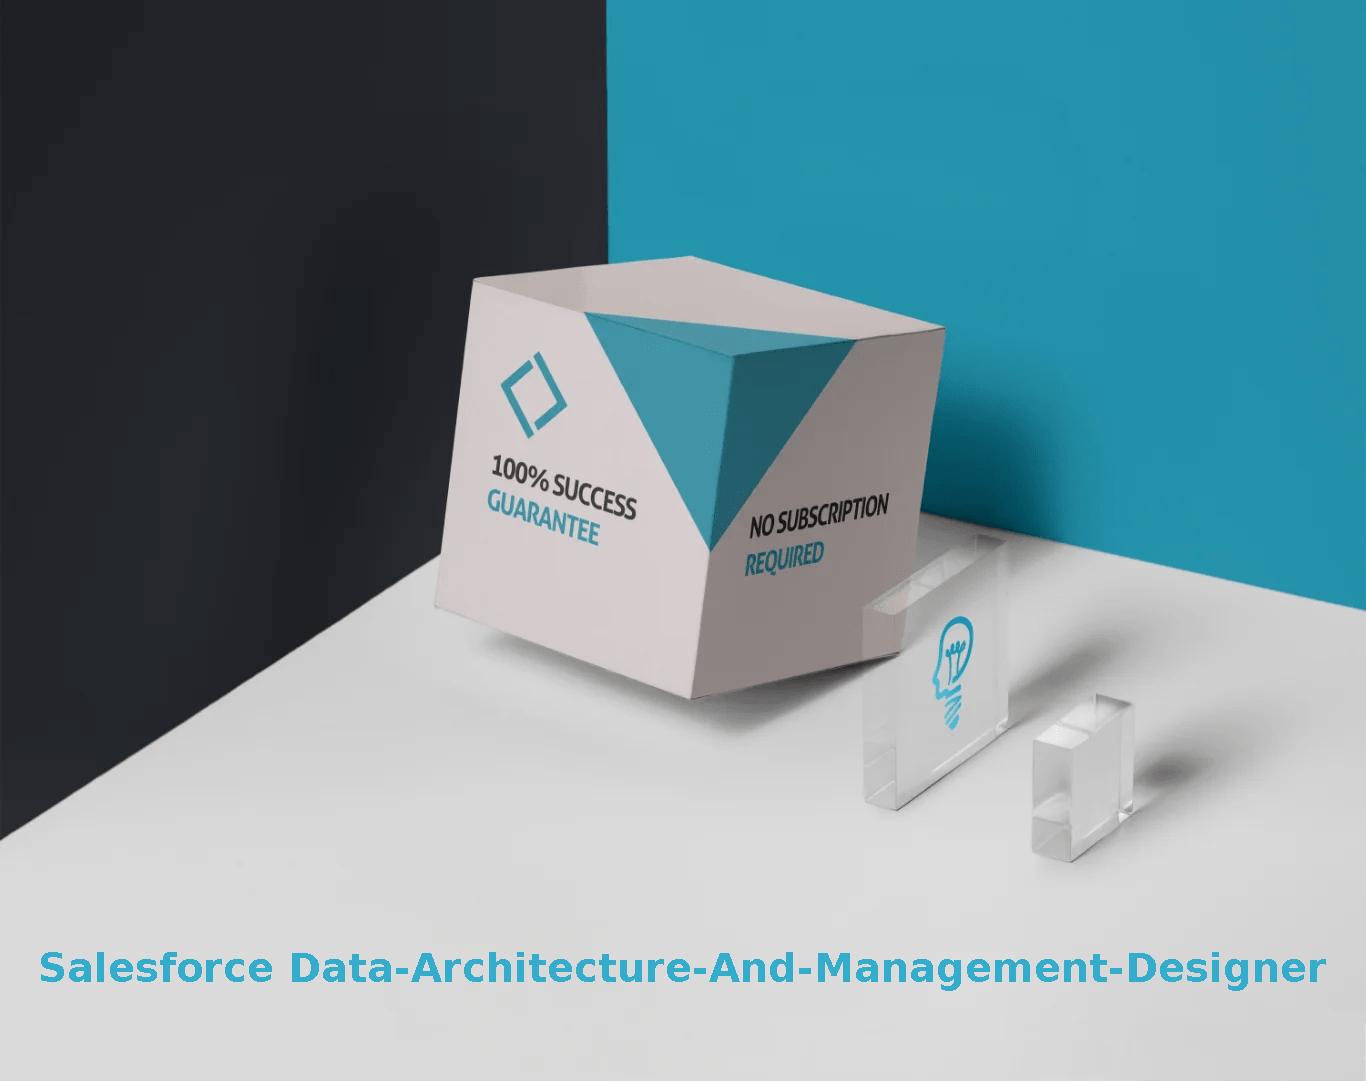 Data-Architecture-And-Management-Designer Dumps